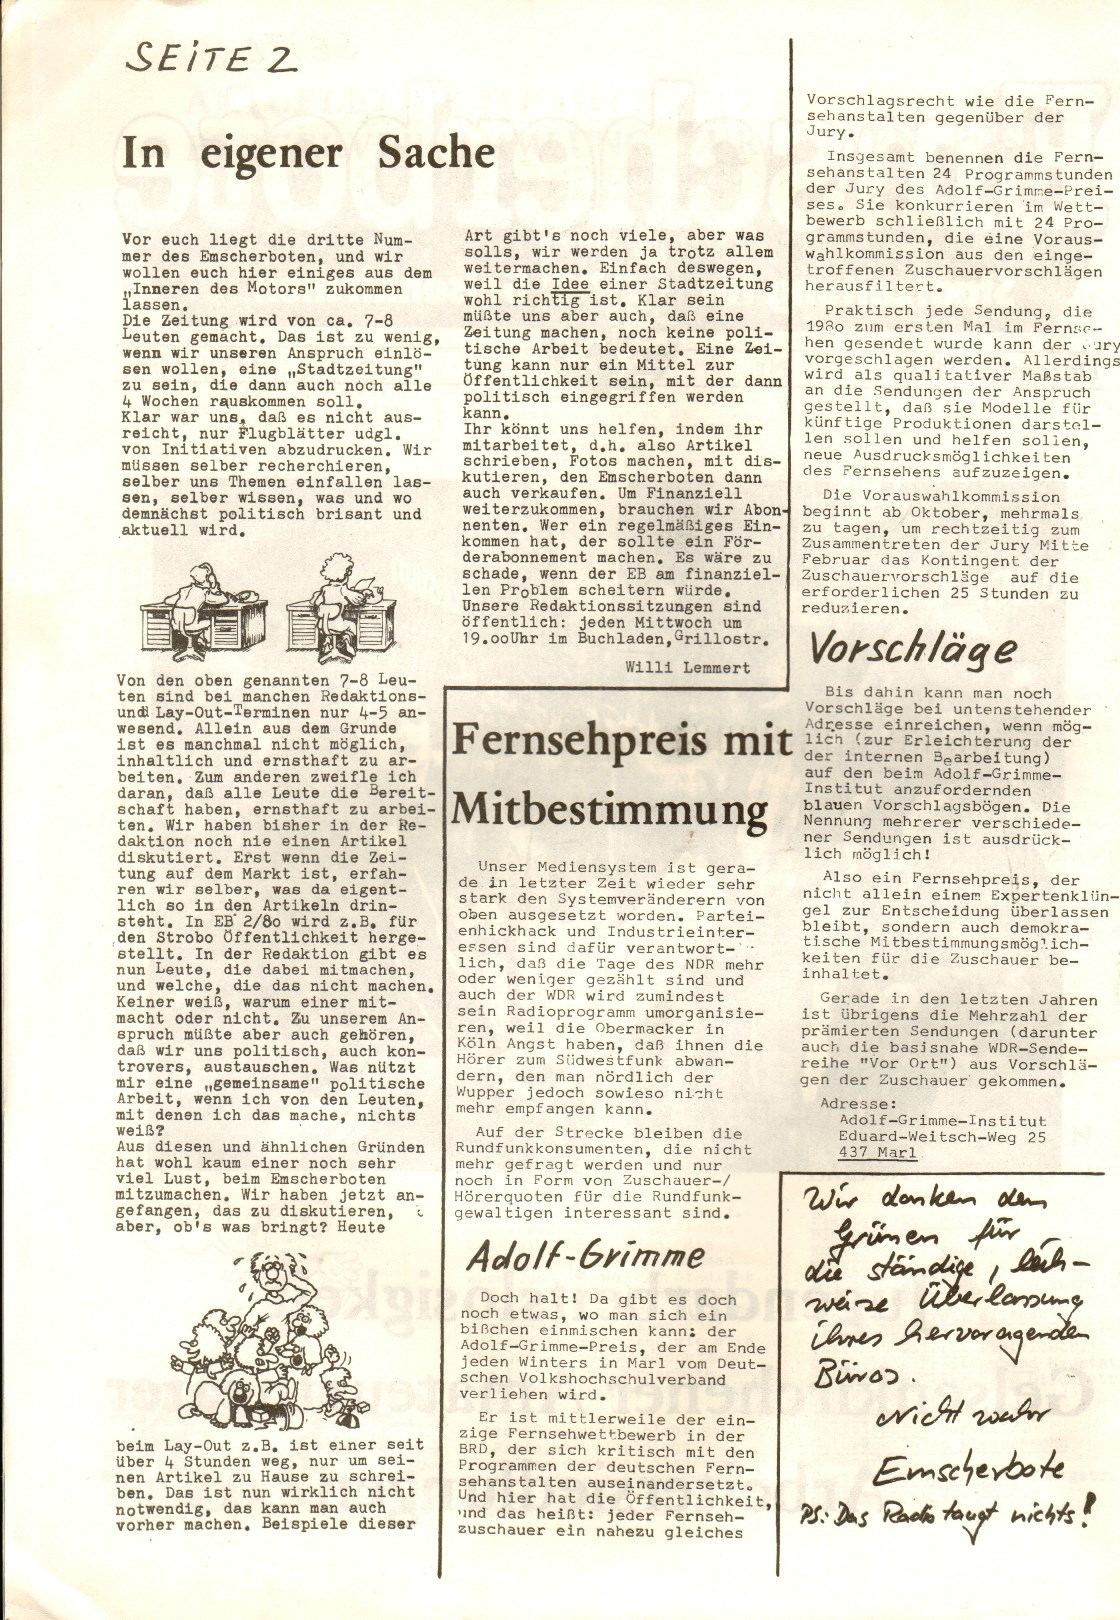 Gelsenkirchen_Emscherbote_1980_03_02